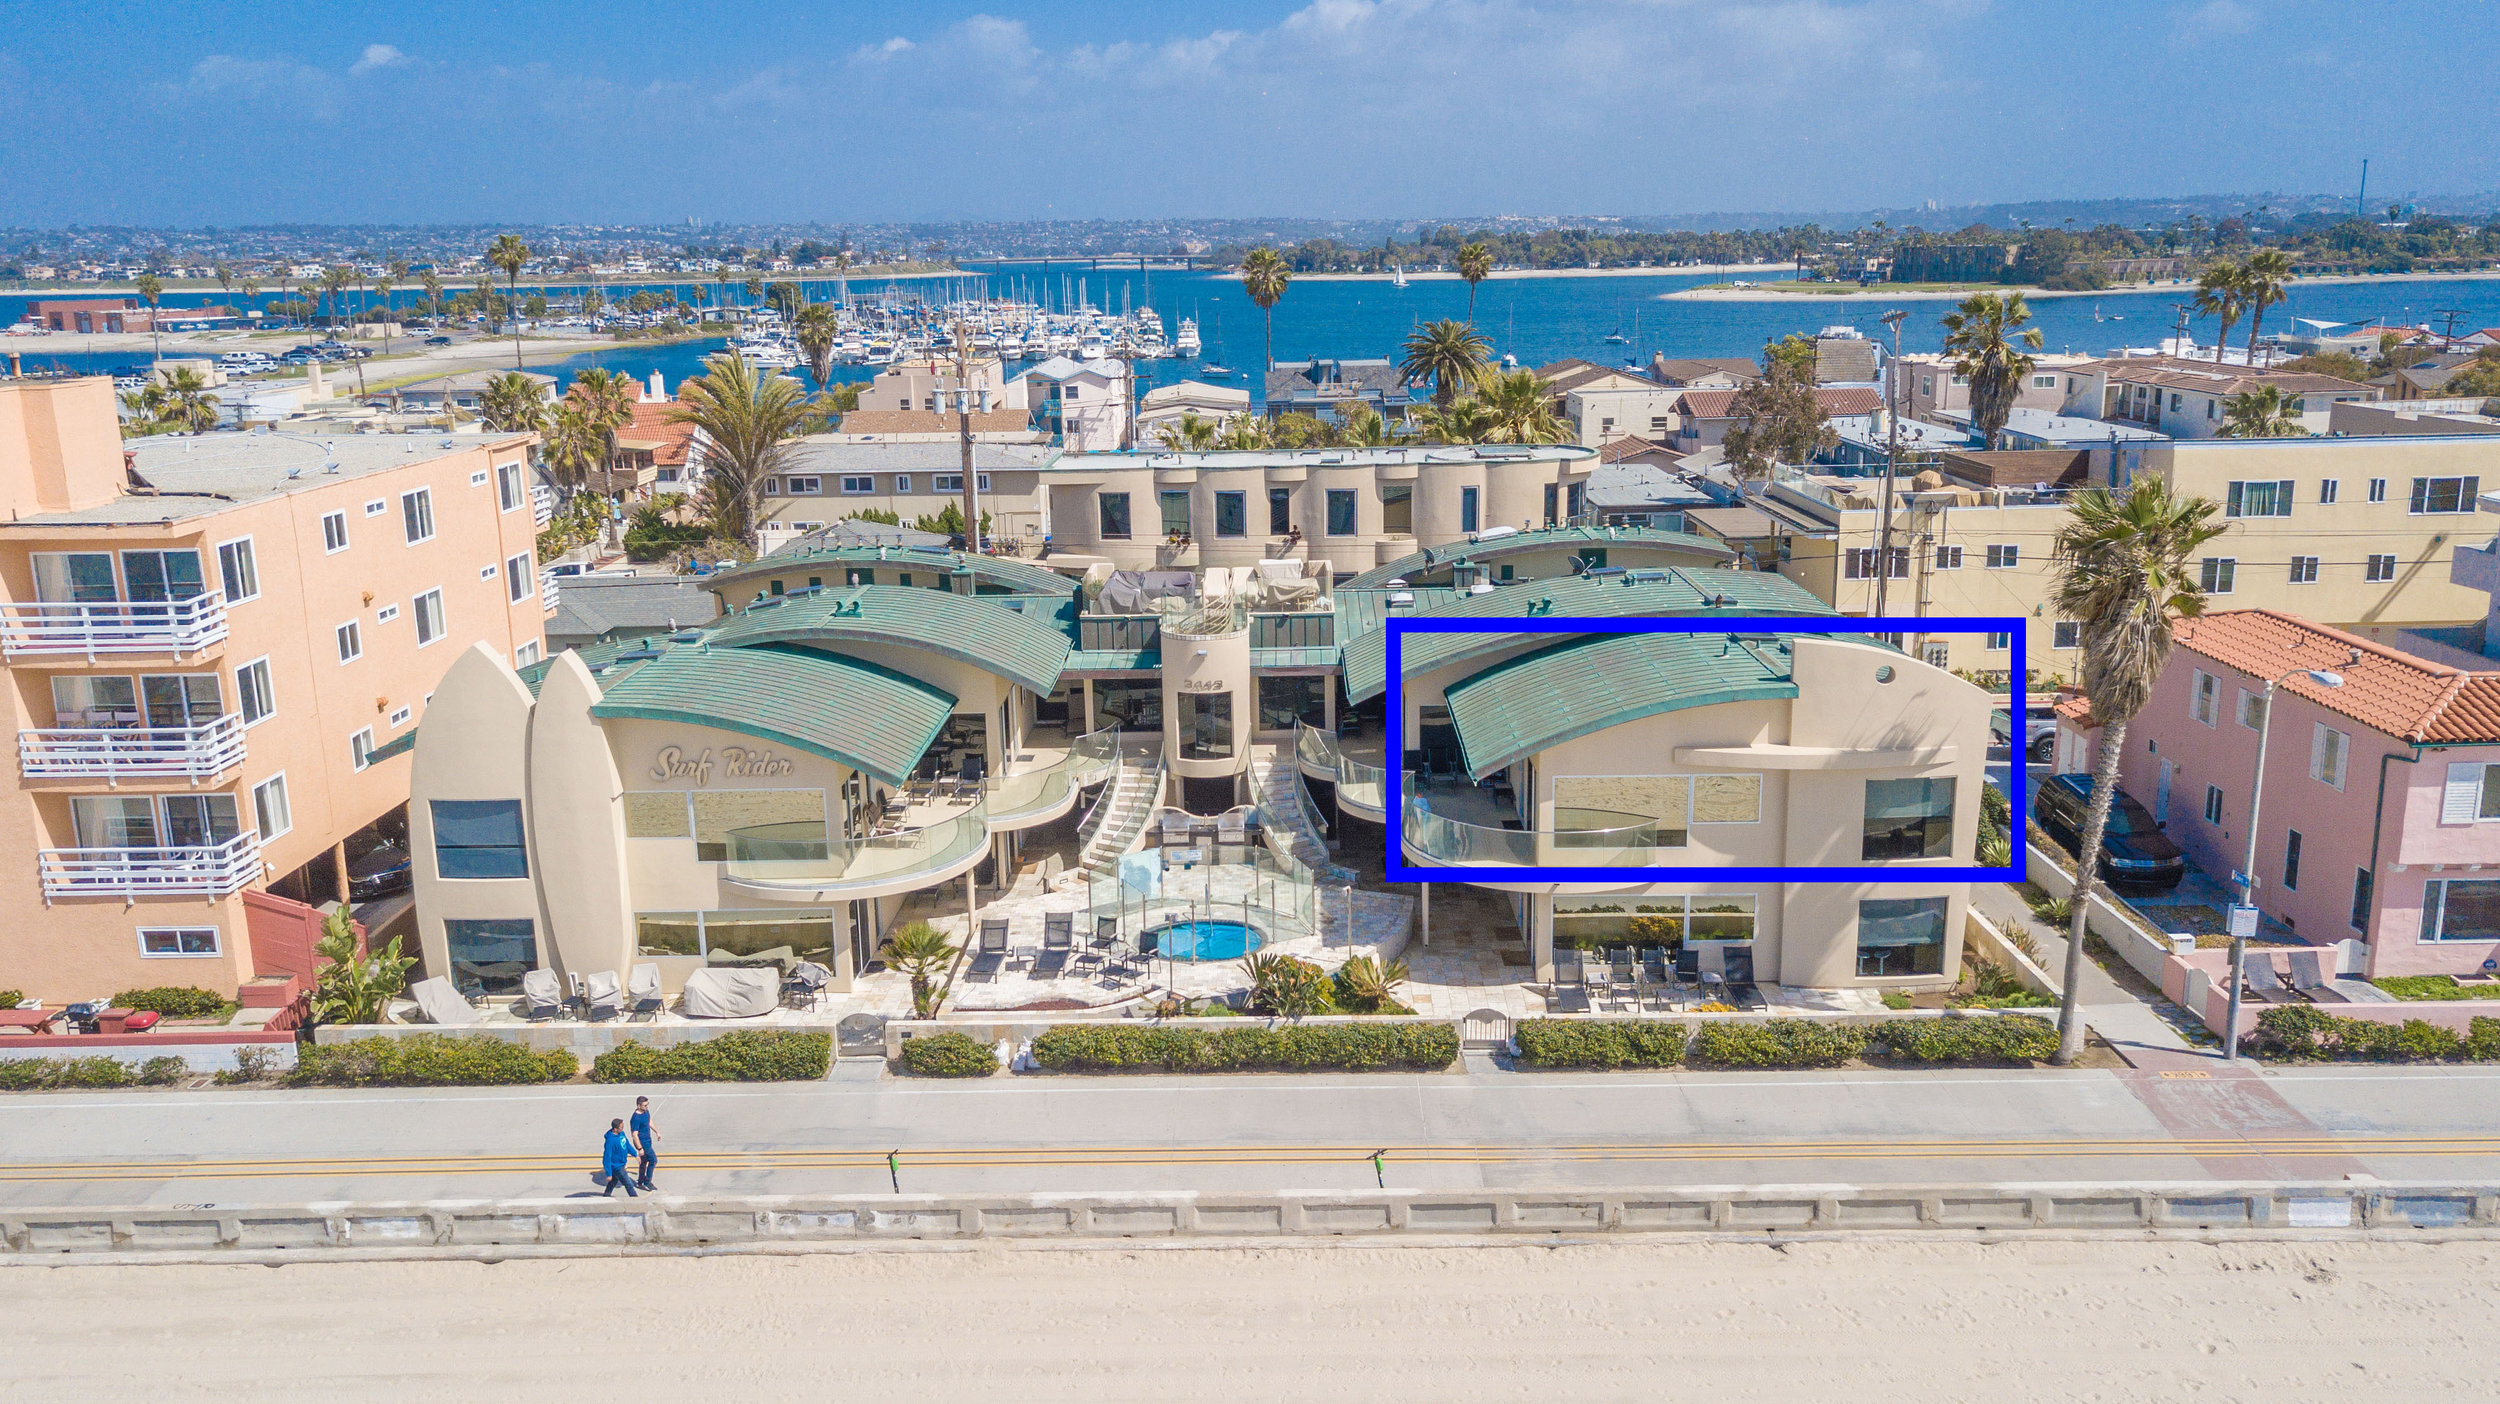 3443 Ocean Front Walk | Mission Beach | $1,350,000